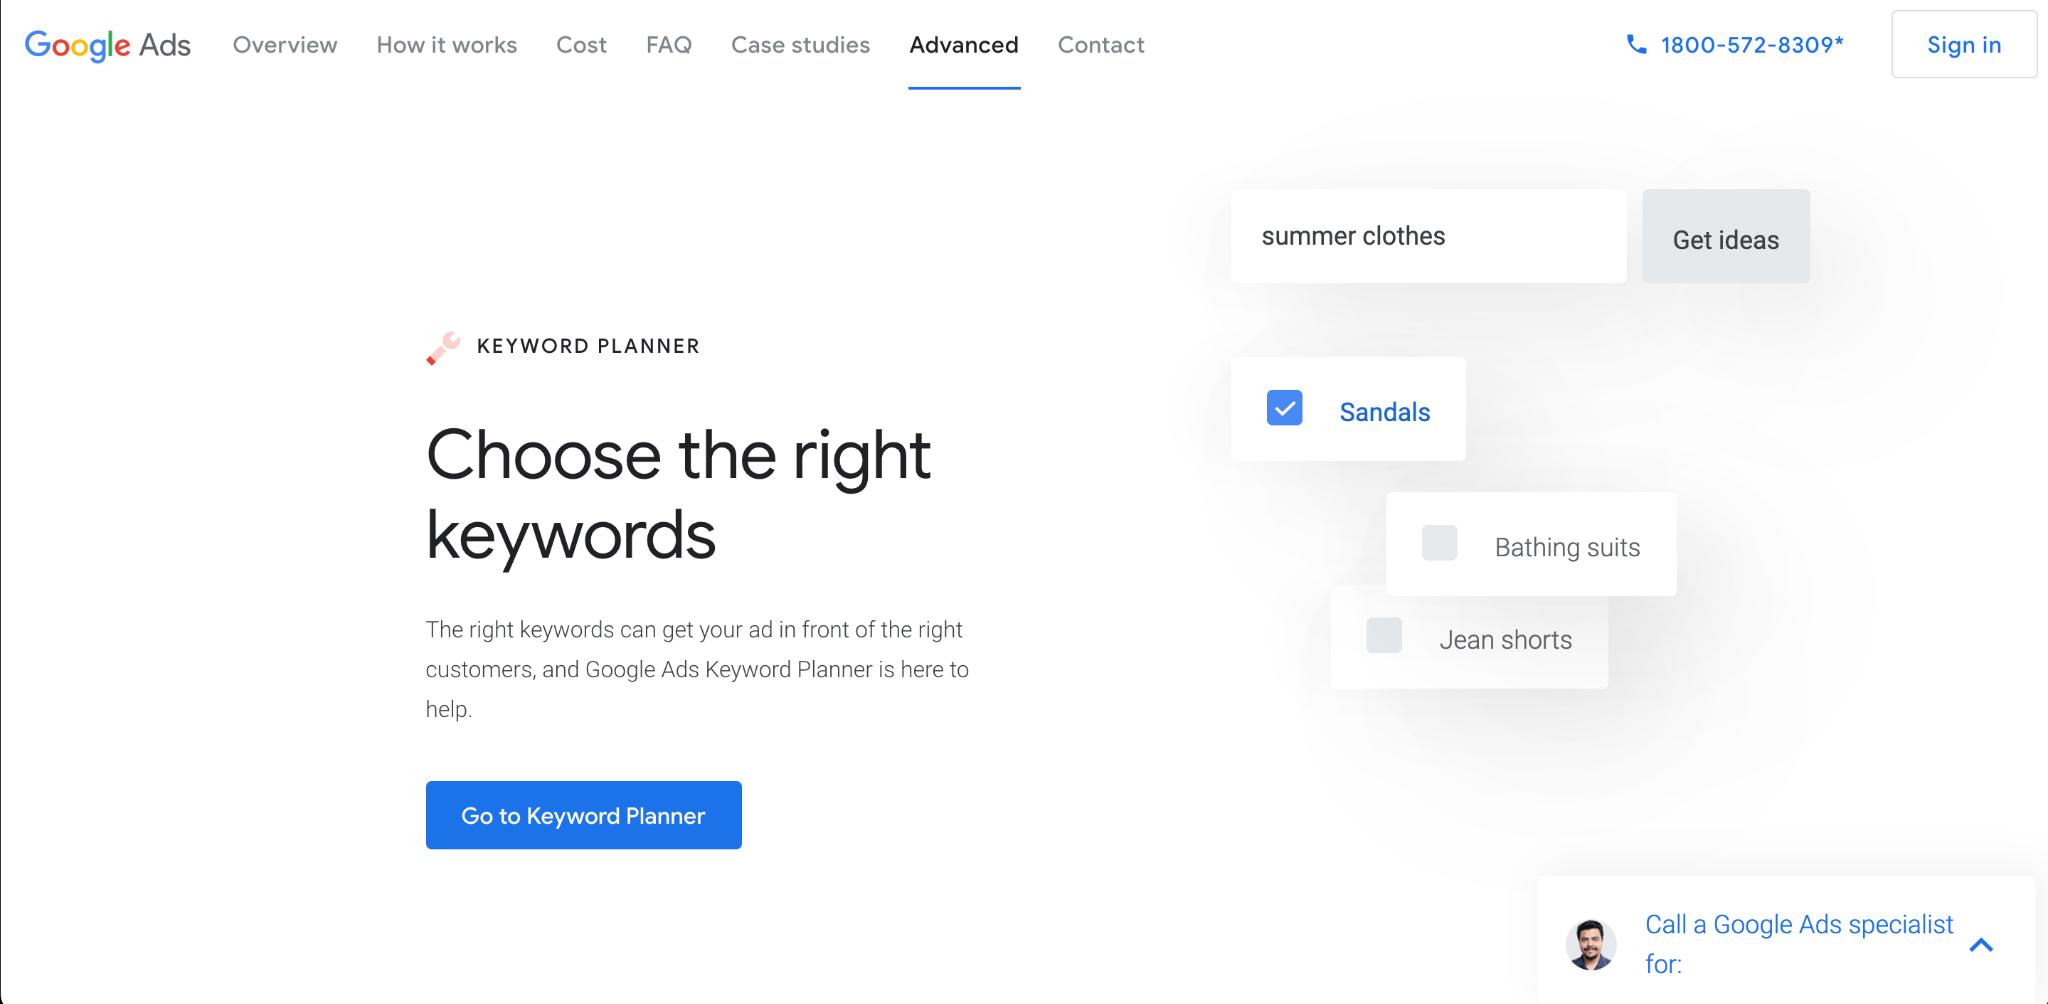 Google Ads Keyword Planner